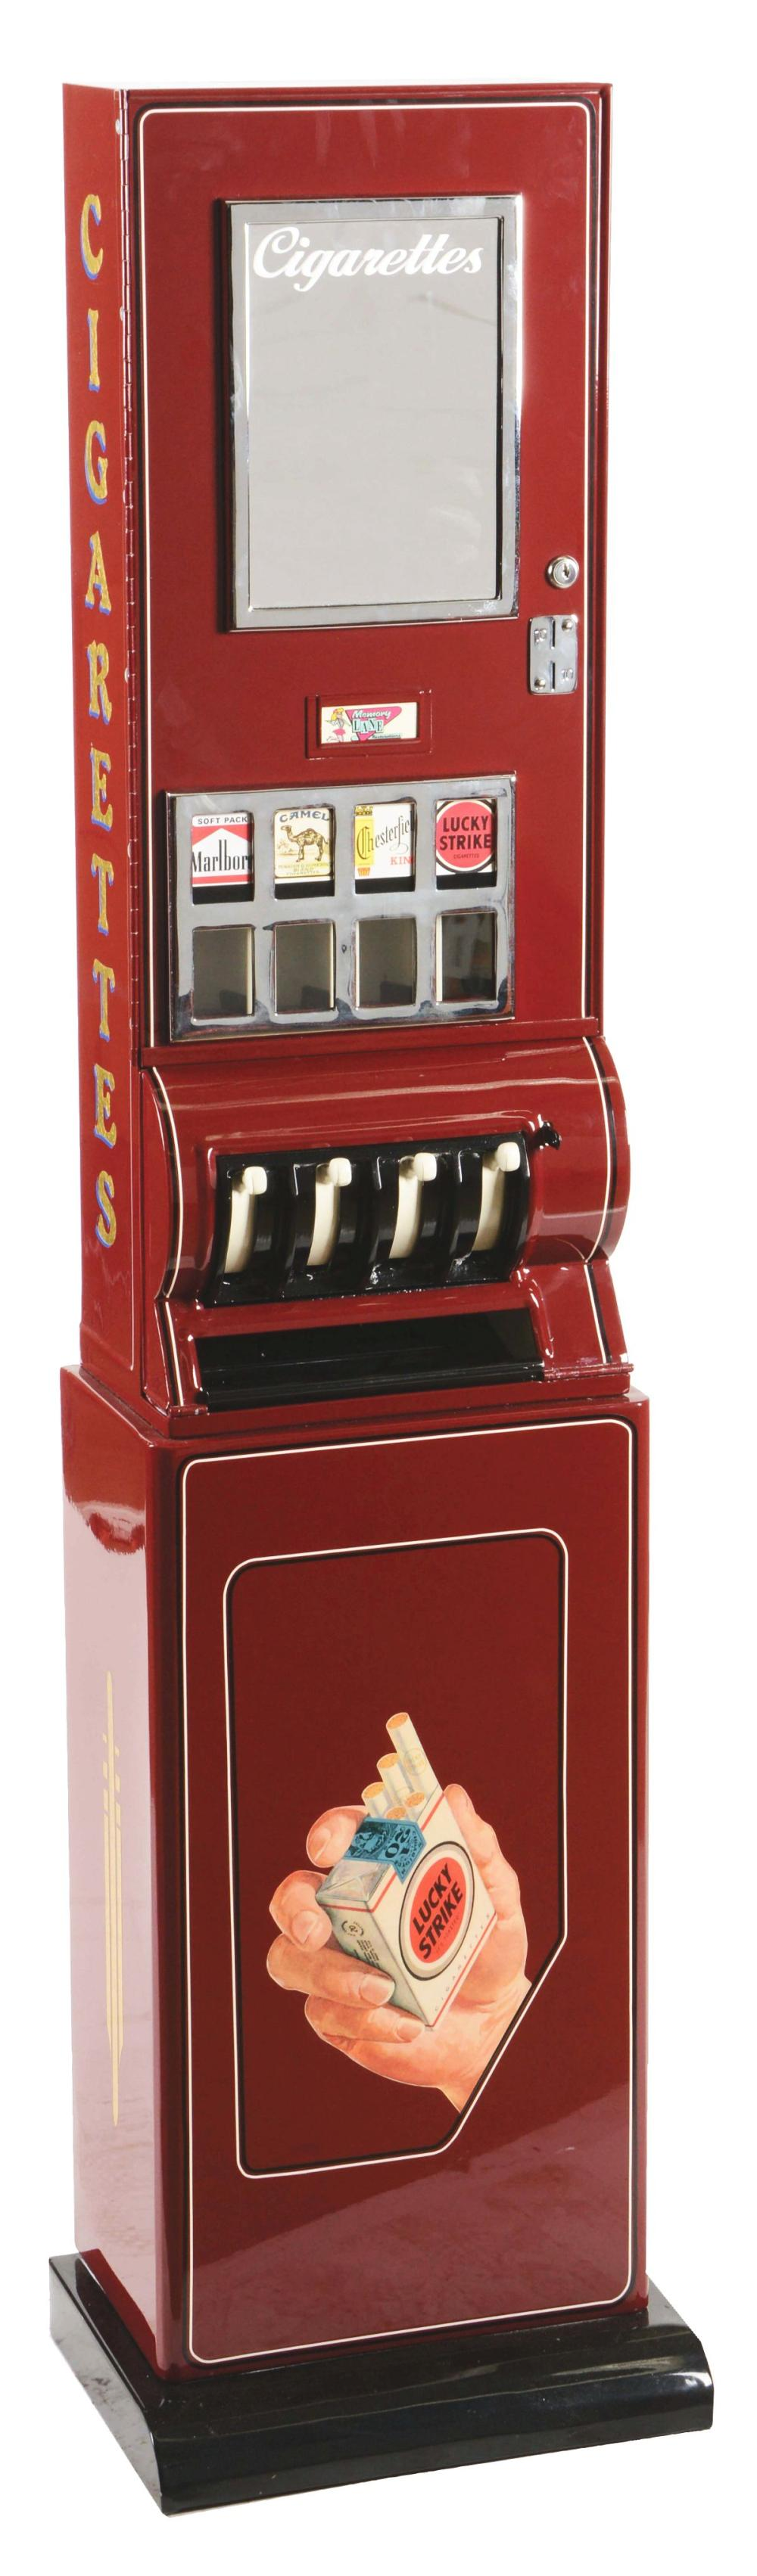 10¢ MEMORY LANE CIGARETTE VENDING MACHINE.